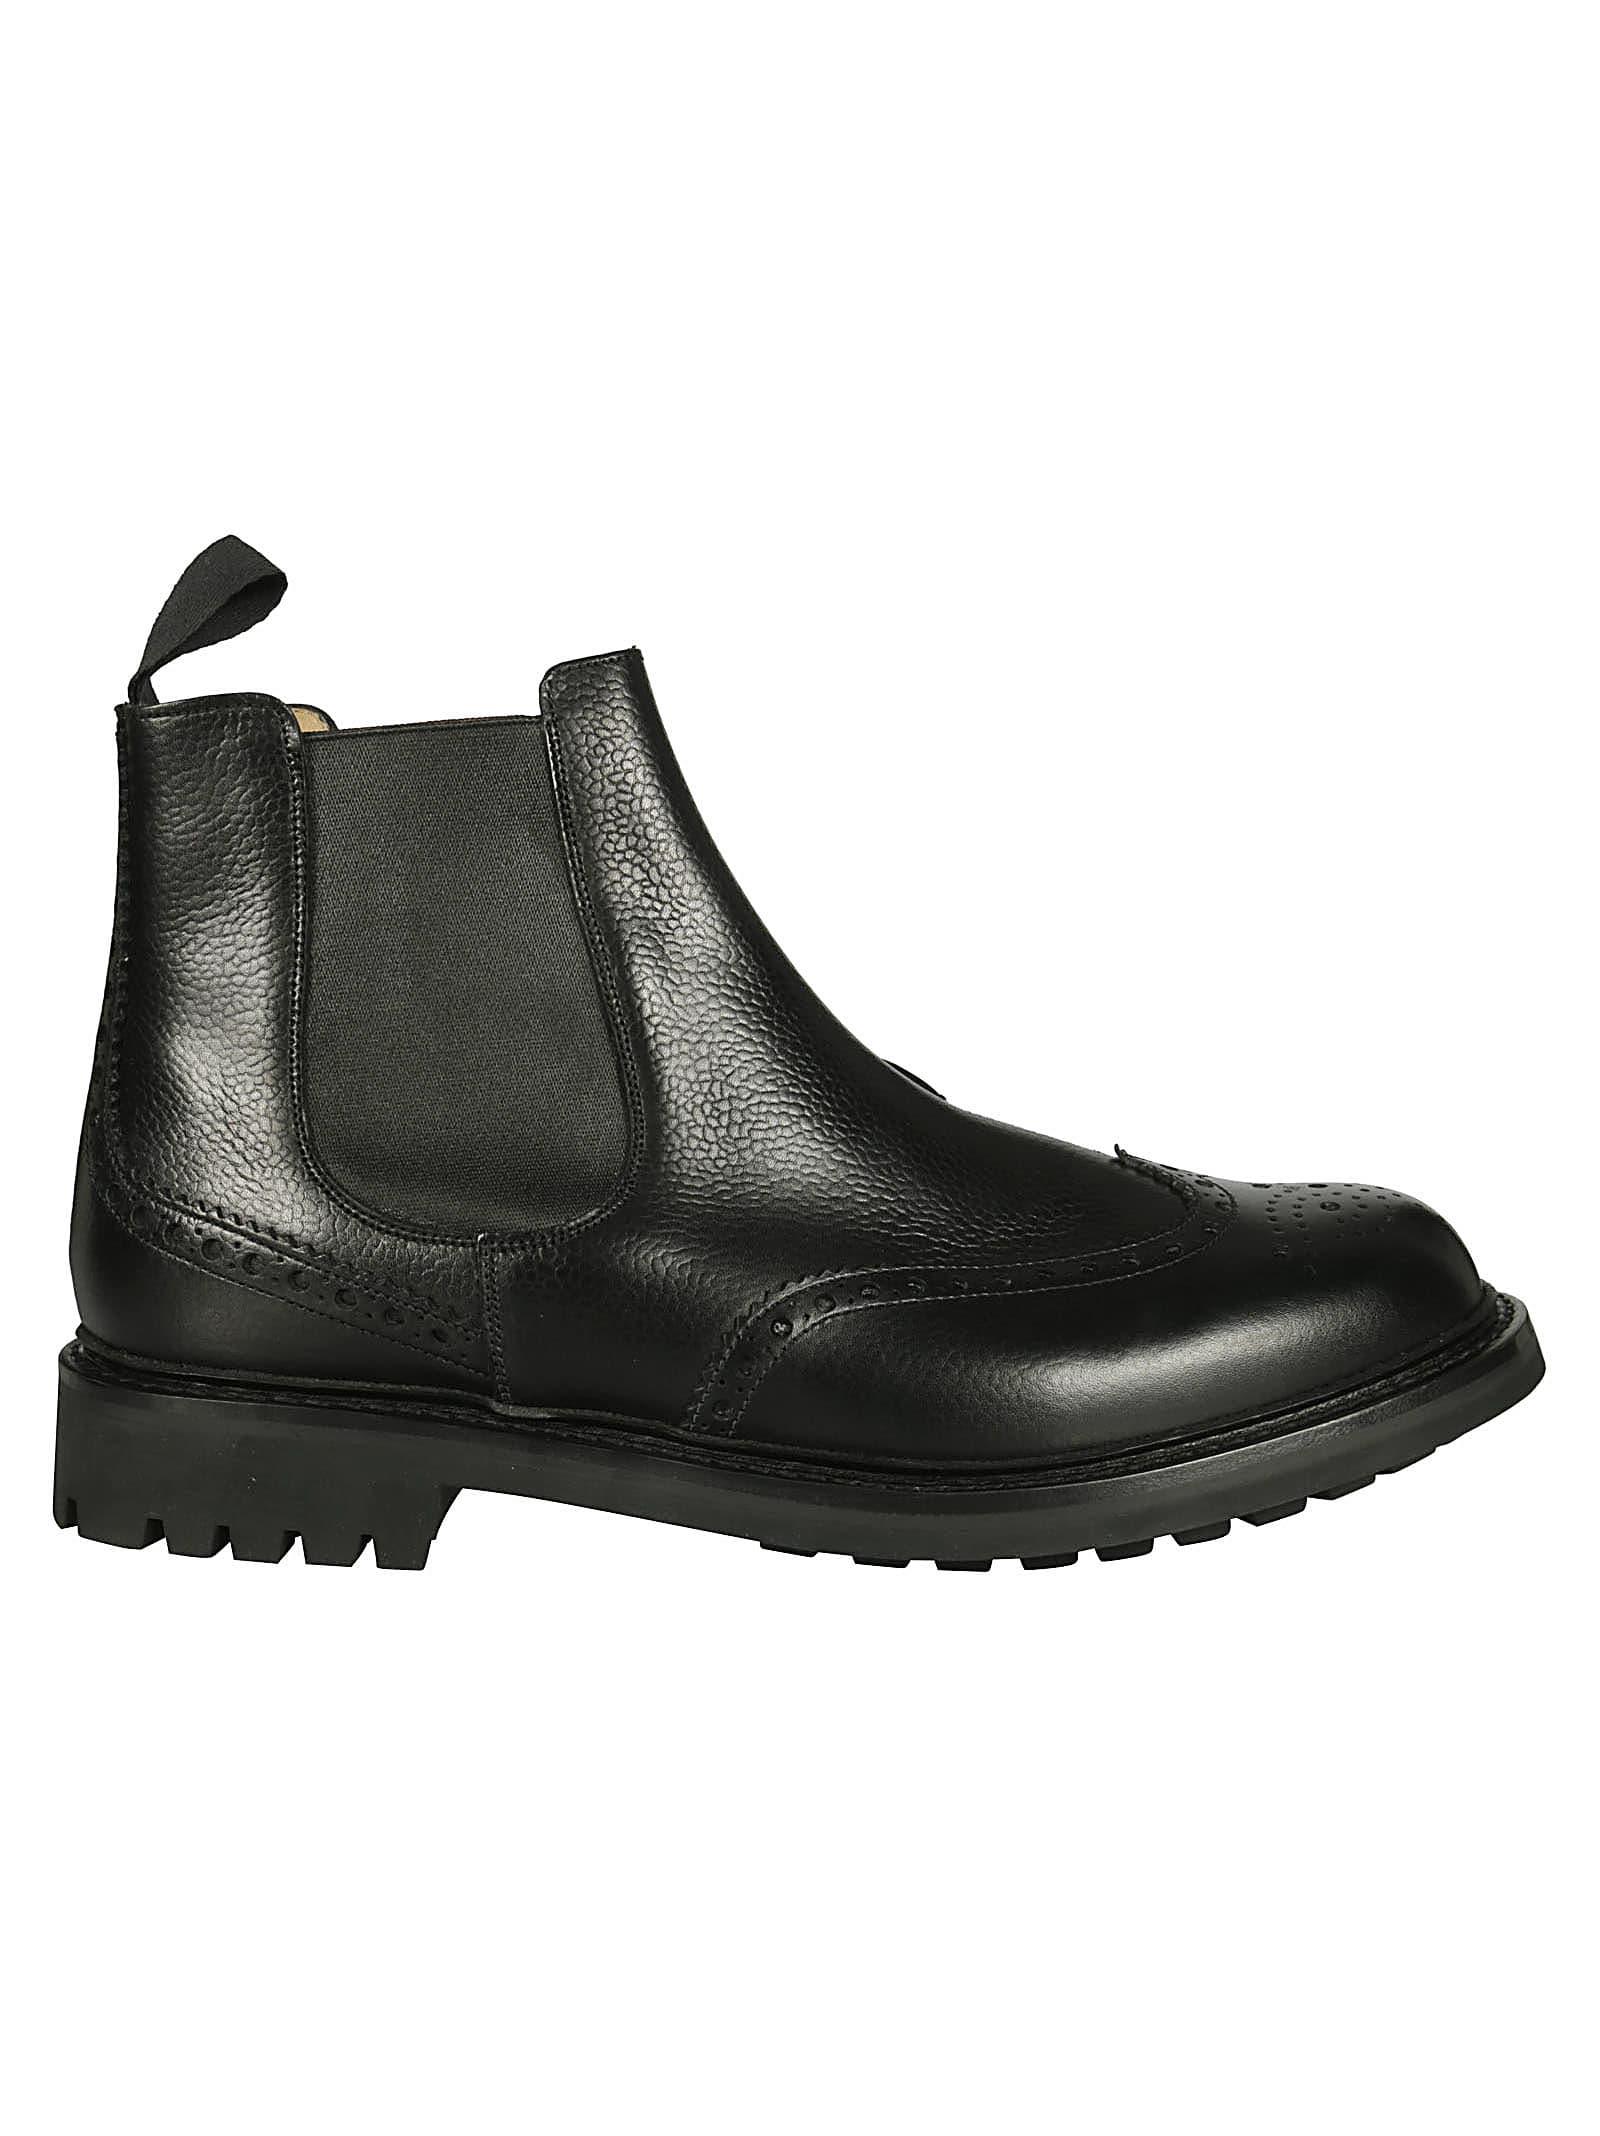 Churchs Mc Entyre Ankle Boots